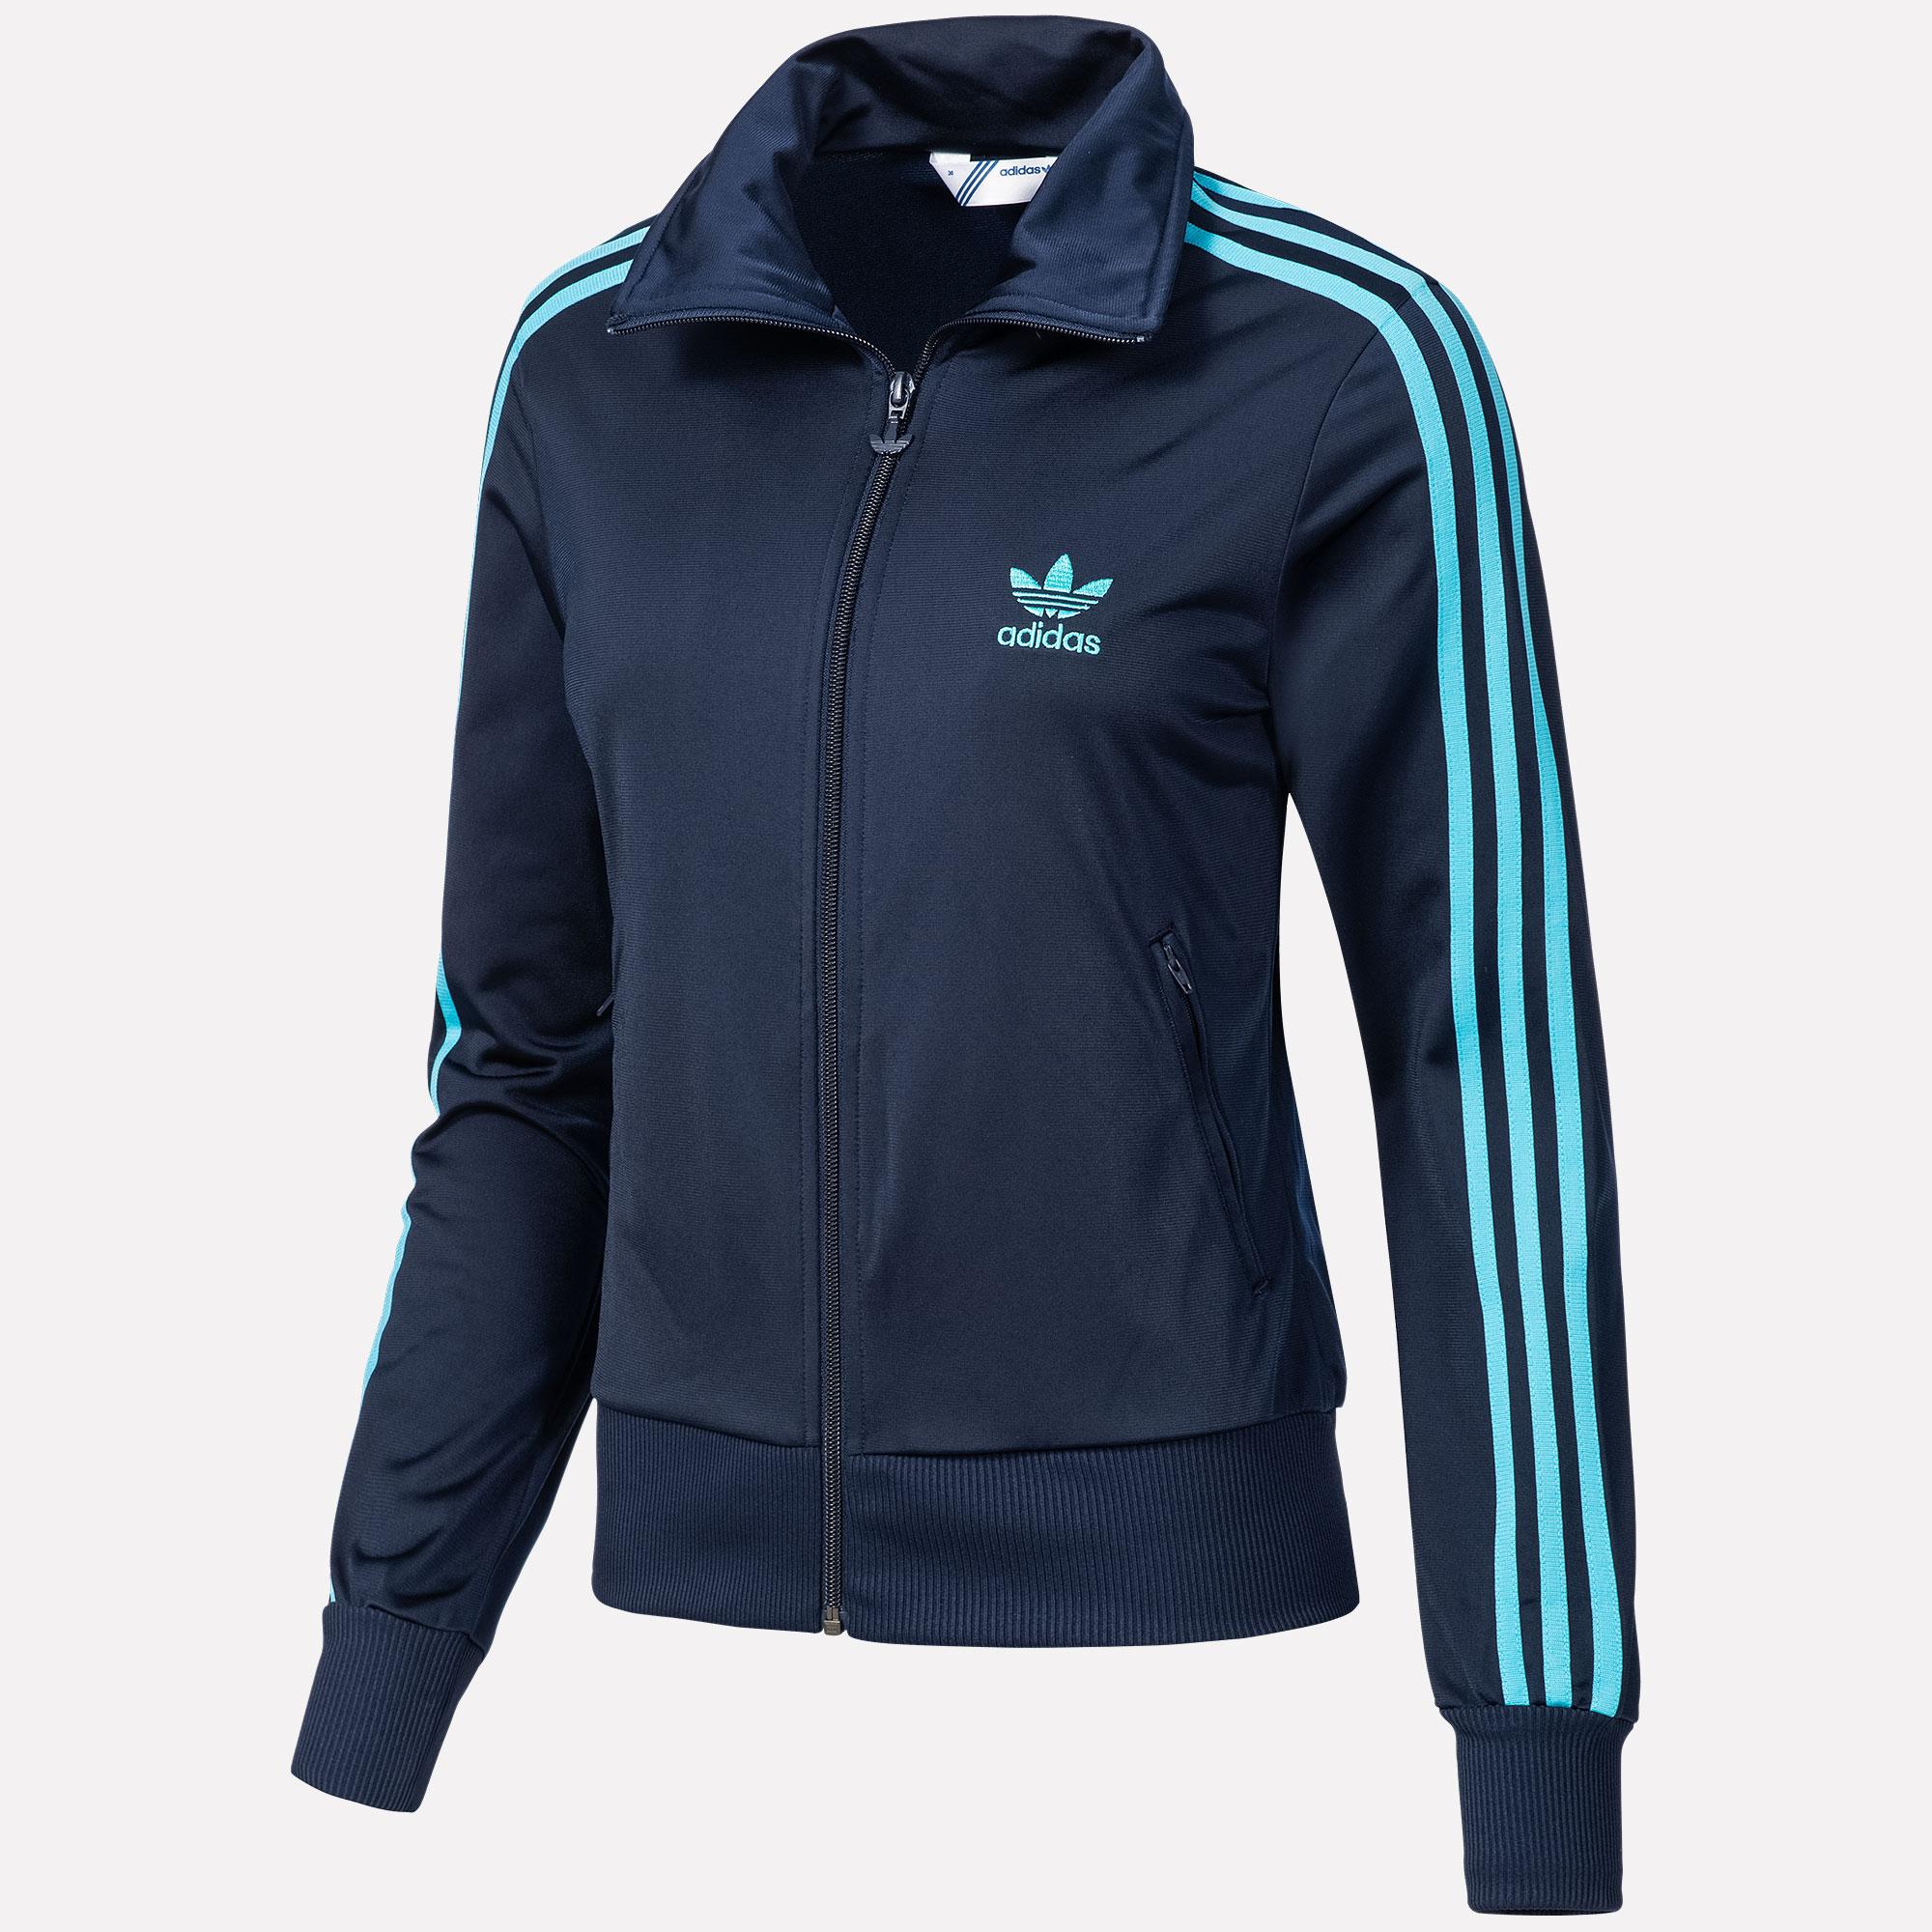 Details about Adidas Firebird Womens Track Jacket Sports Jacket Superdry Hoodie 34 42 show original title